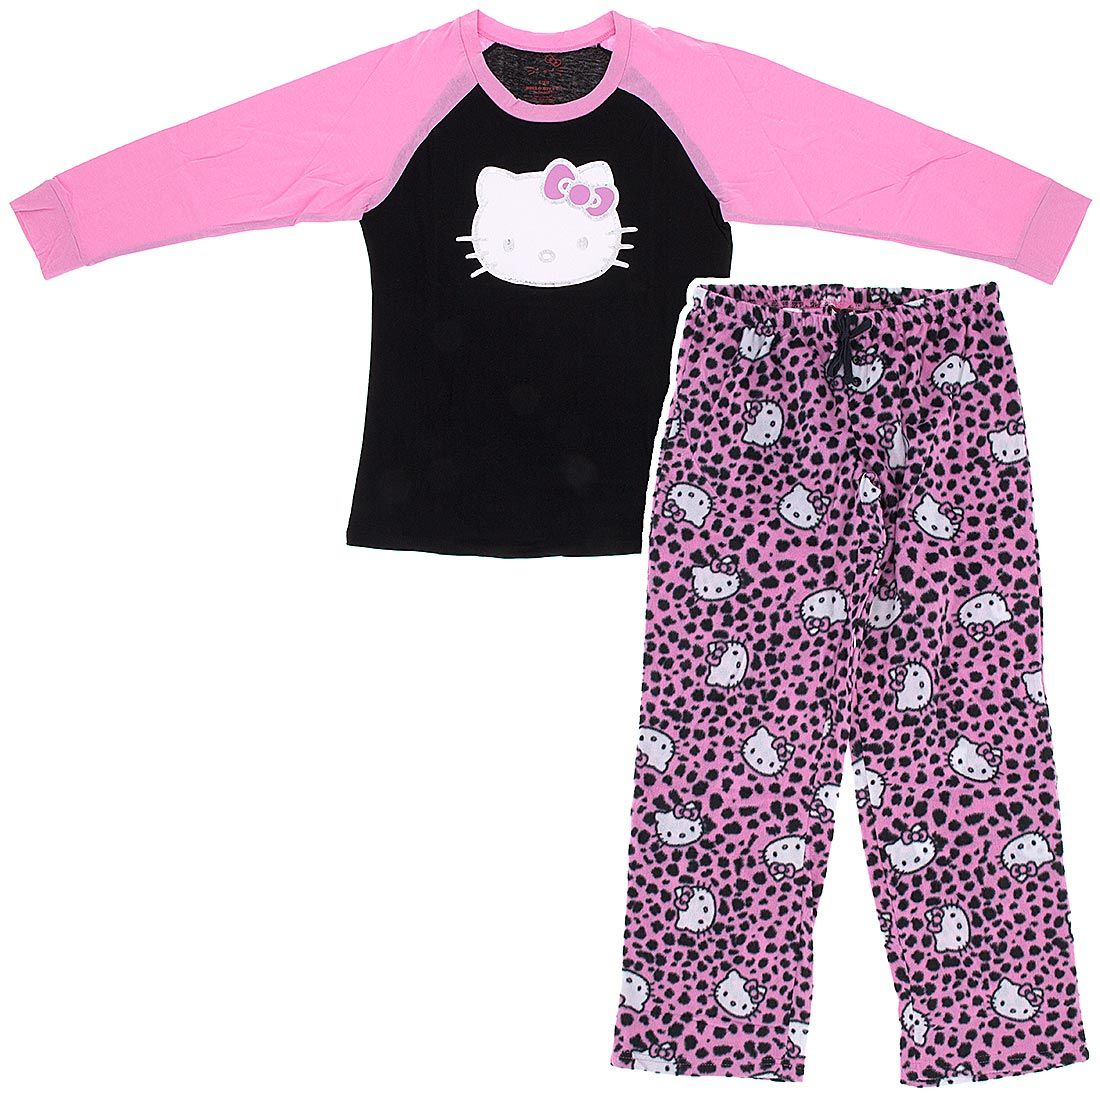 ea0652688 Barbie Pink Pajamas for Toddler Girls - Click to enlarge